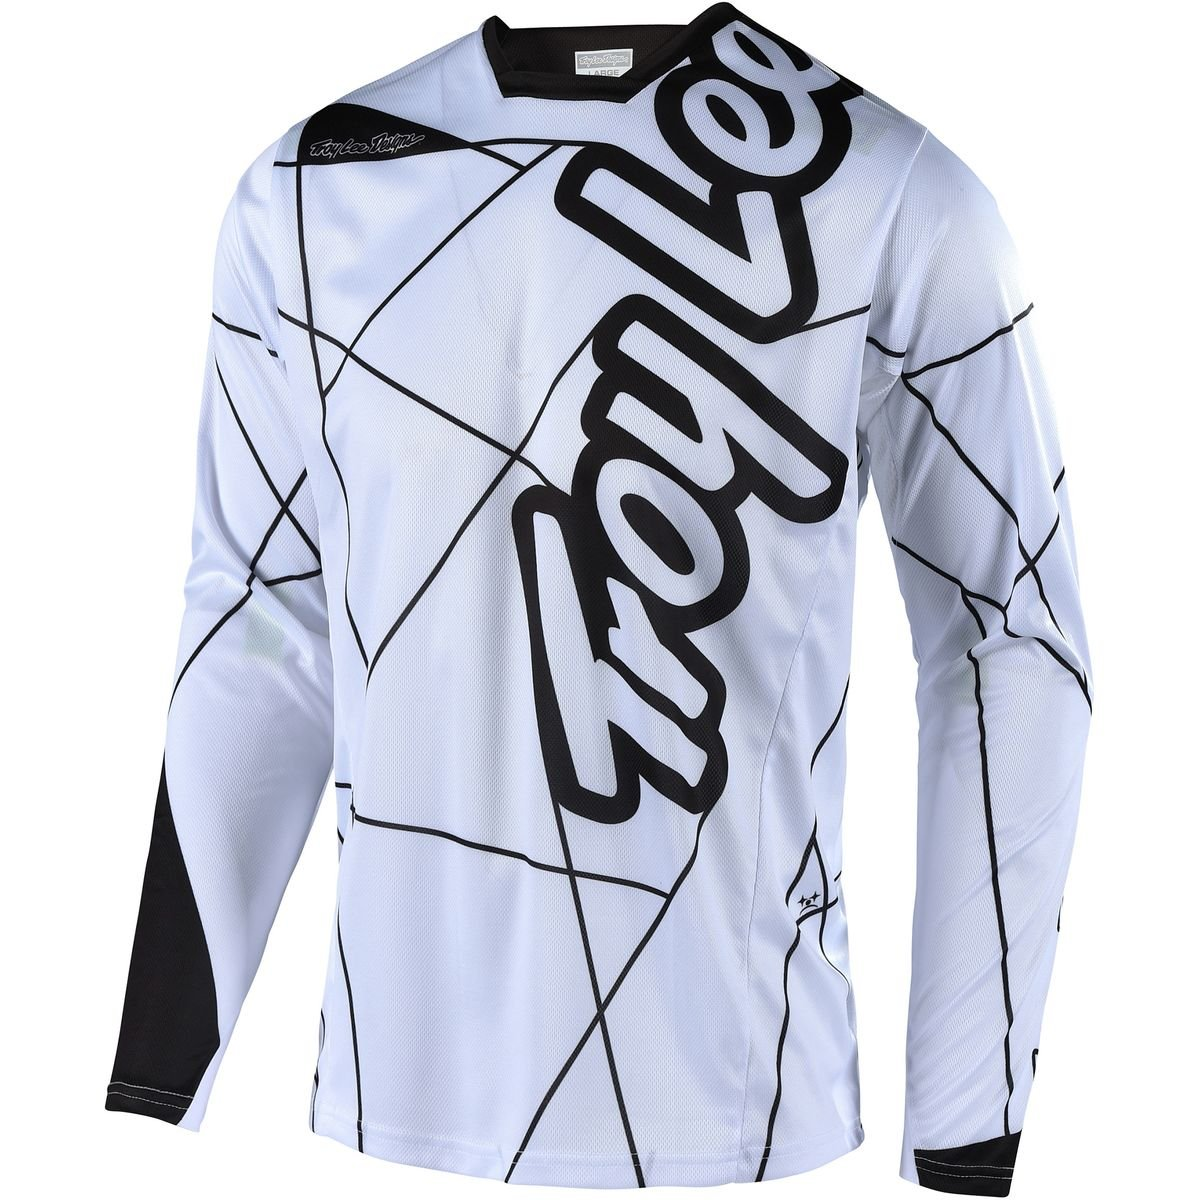 Troy Lee Designs Sprint Long-Sleeve Jersey - Men's Metric White/Black, S